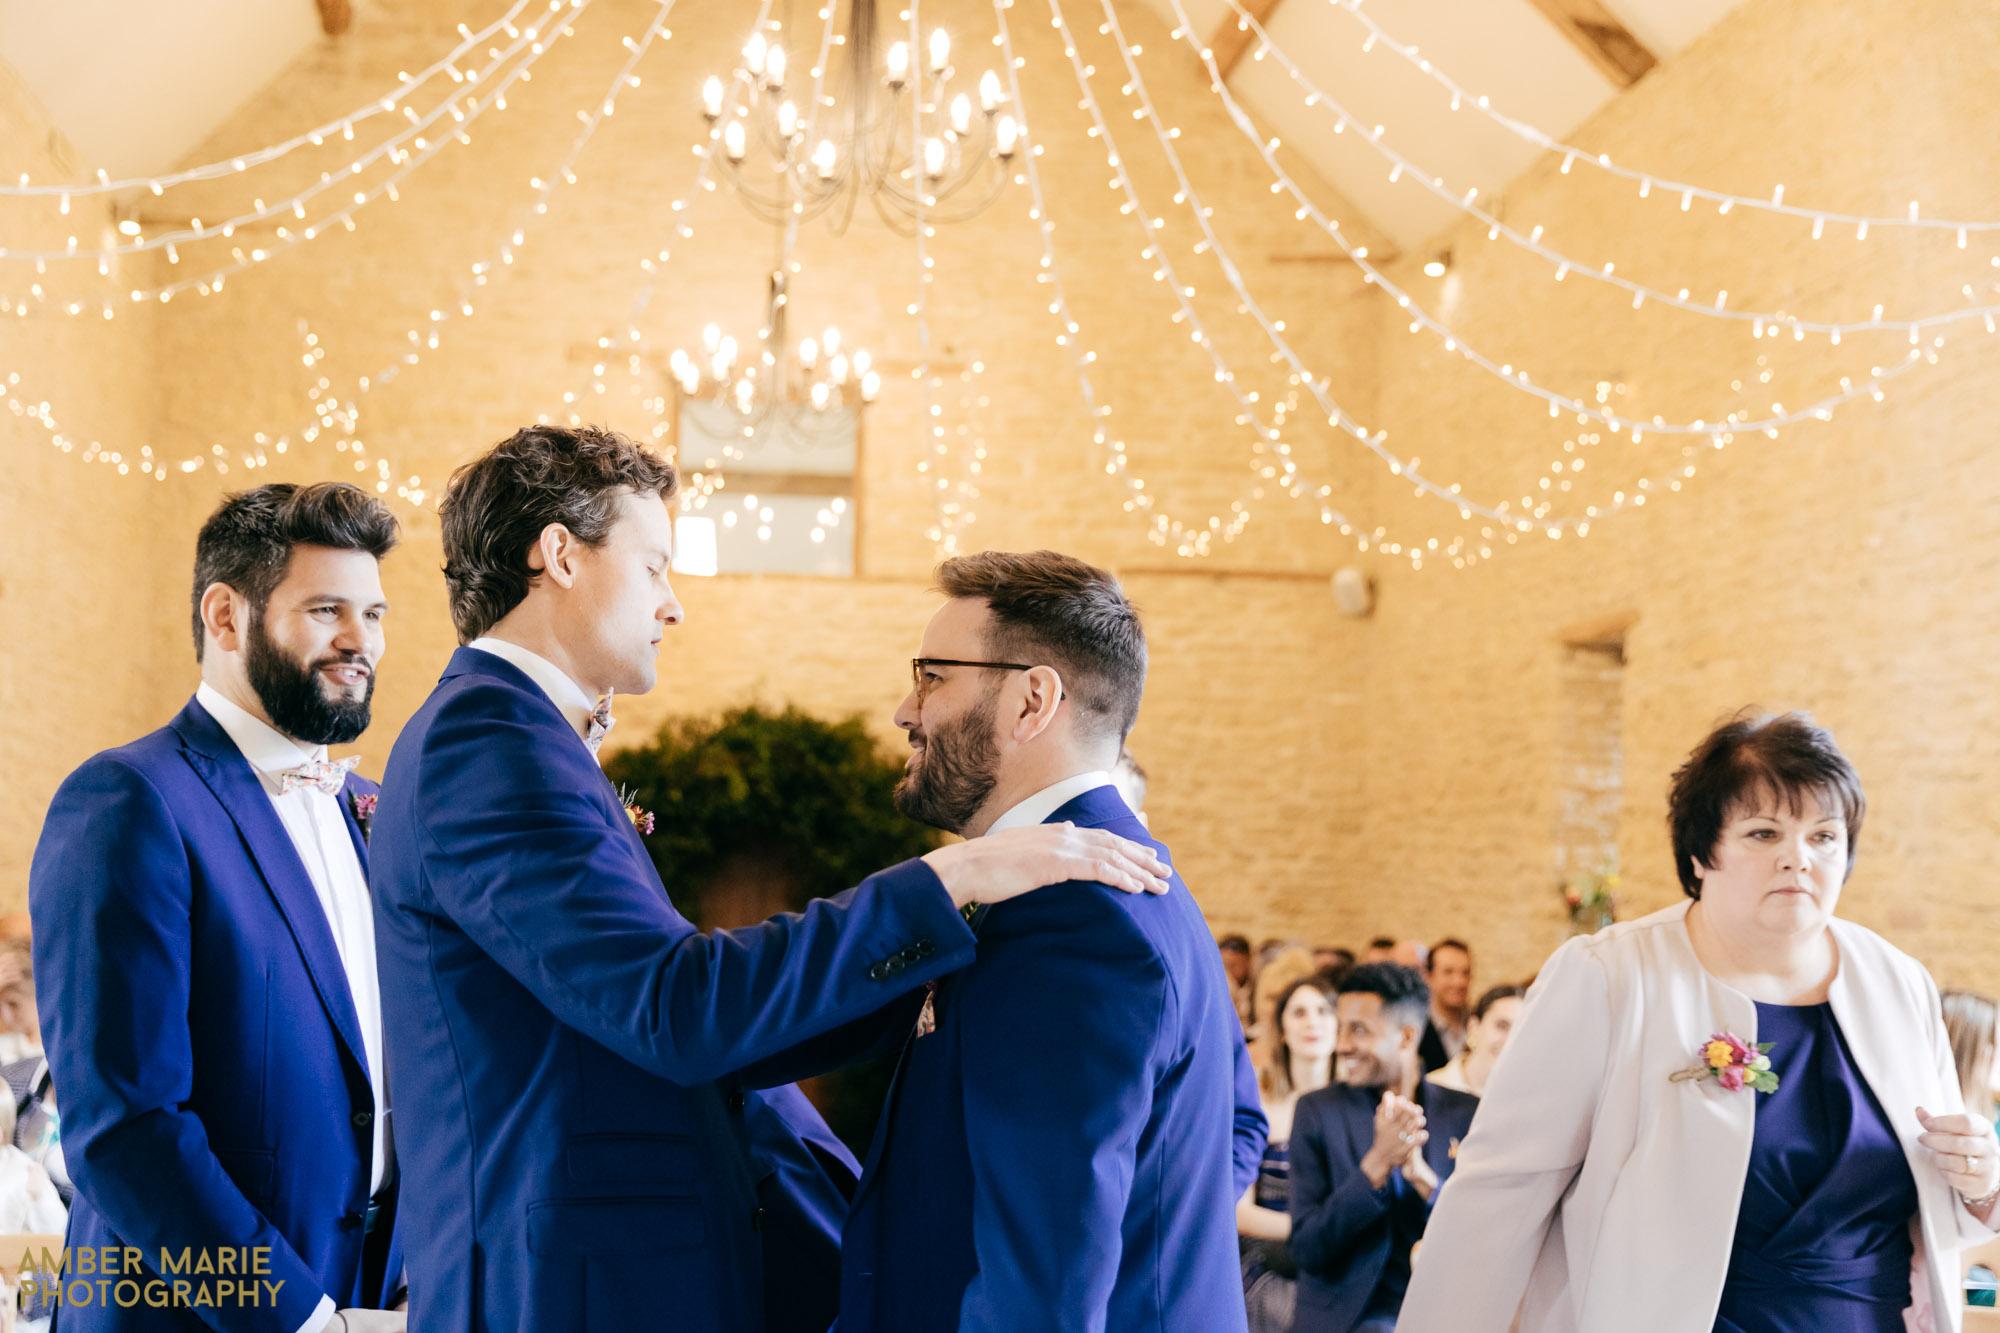 Kingscote Barn Wedding Photography by creative gloucestershire wedding photographer